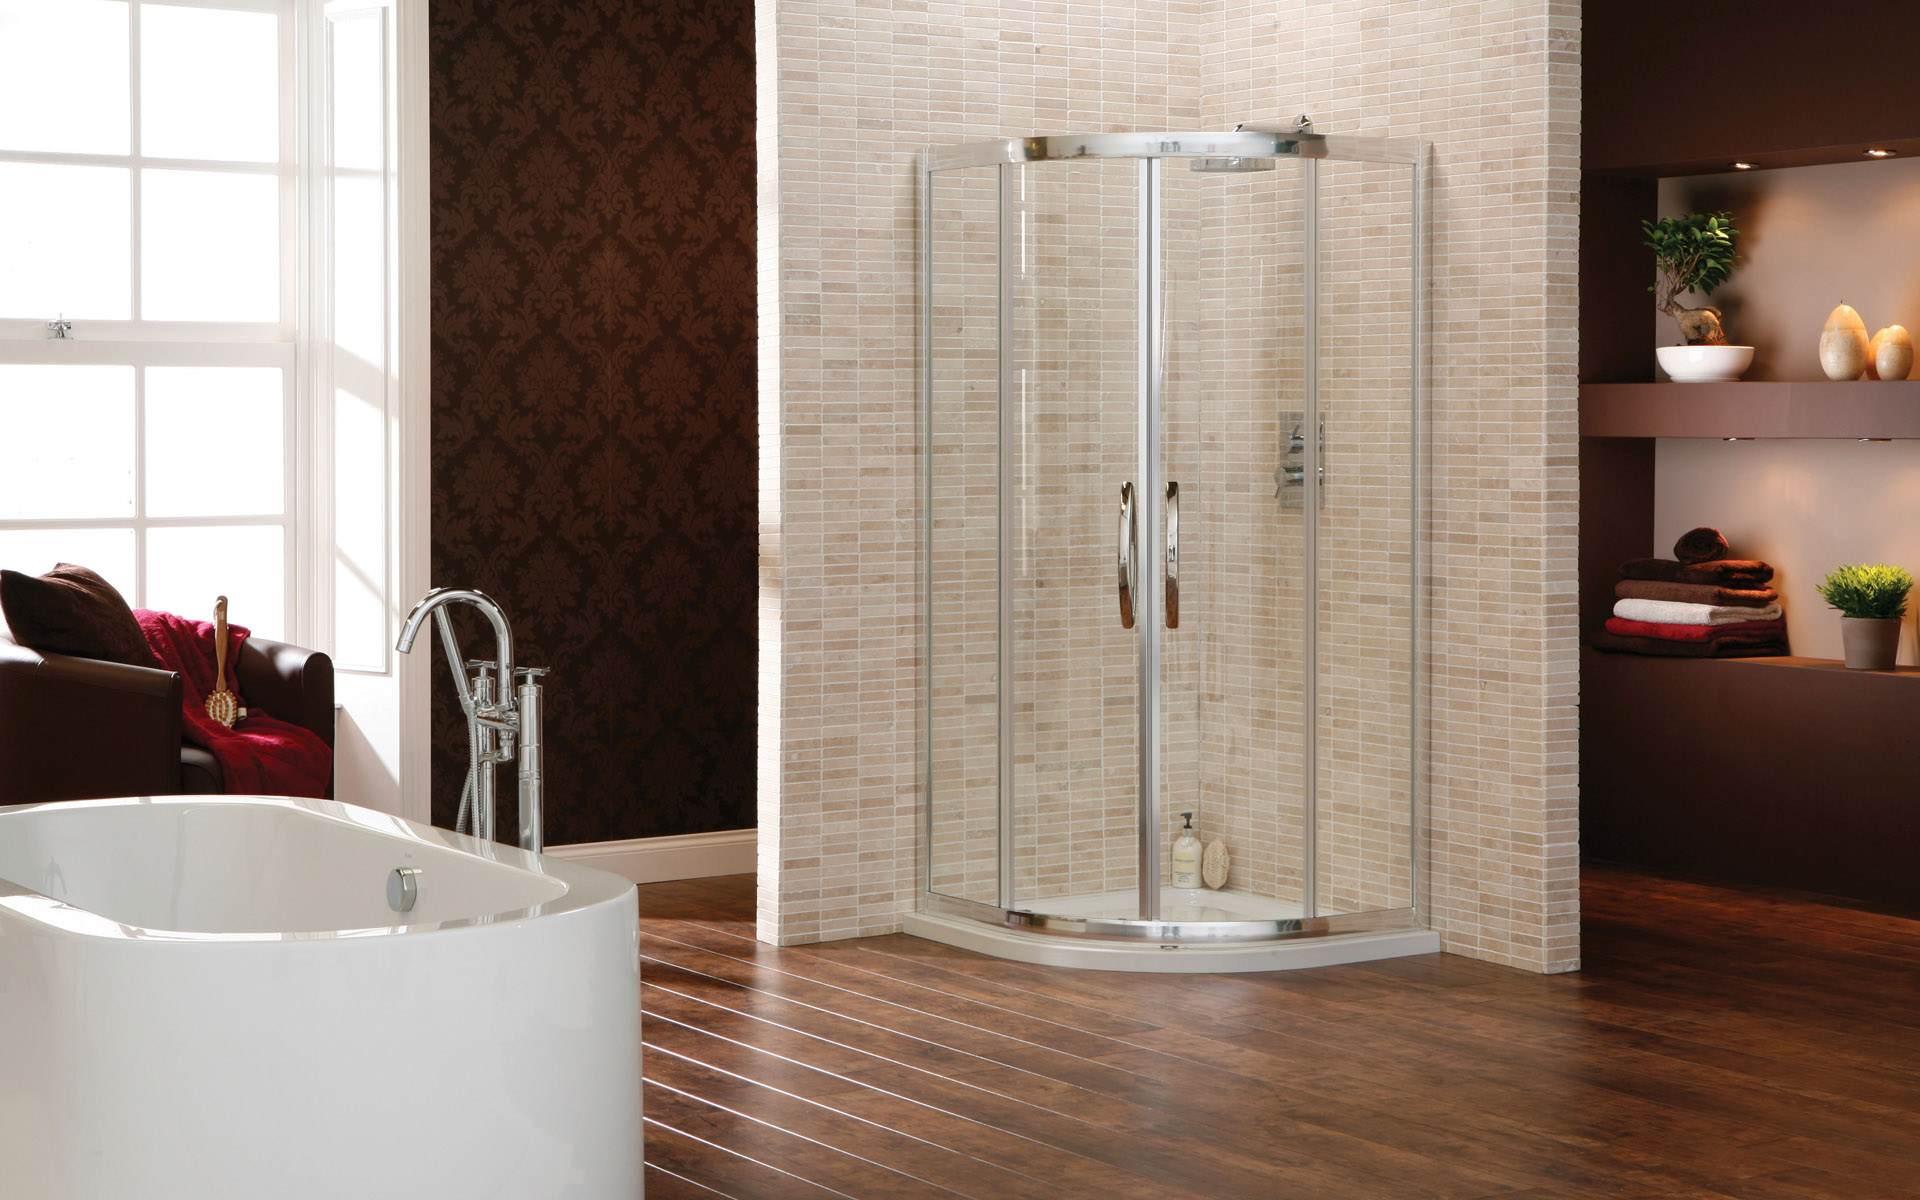 bathroom-apartment-bathroom-ideas-shower-curtain-wallpaper-living-3-decoration-ideas